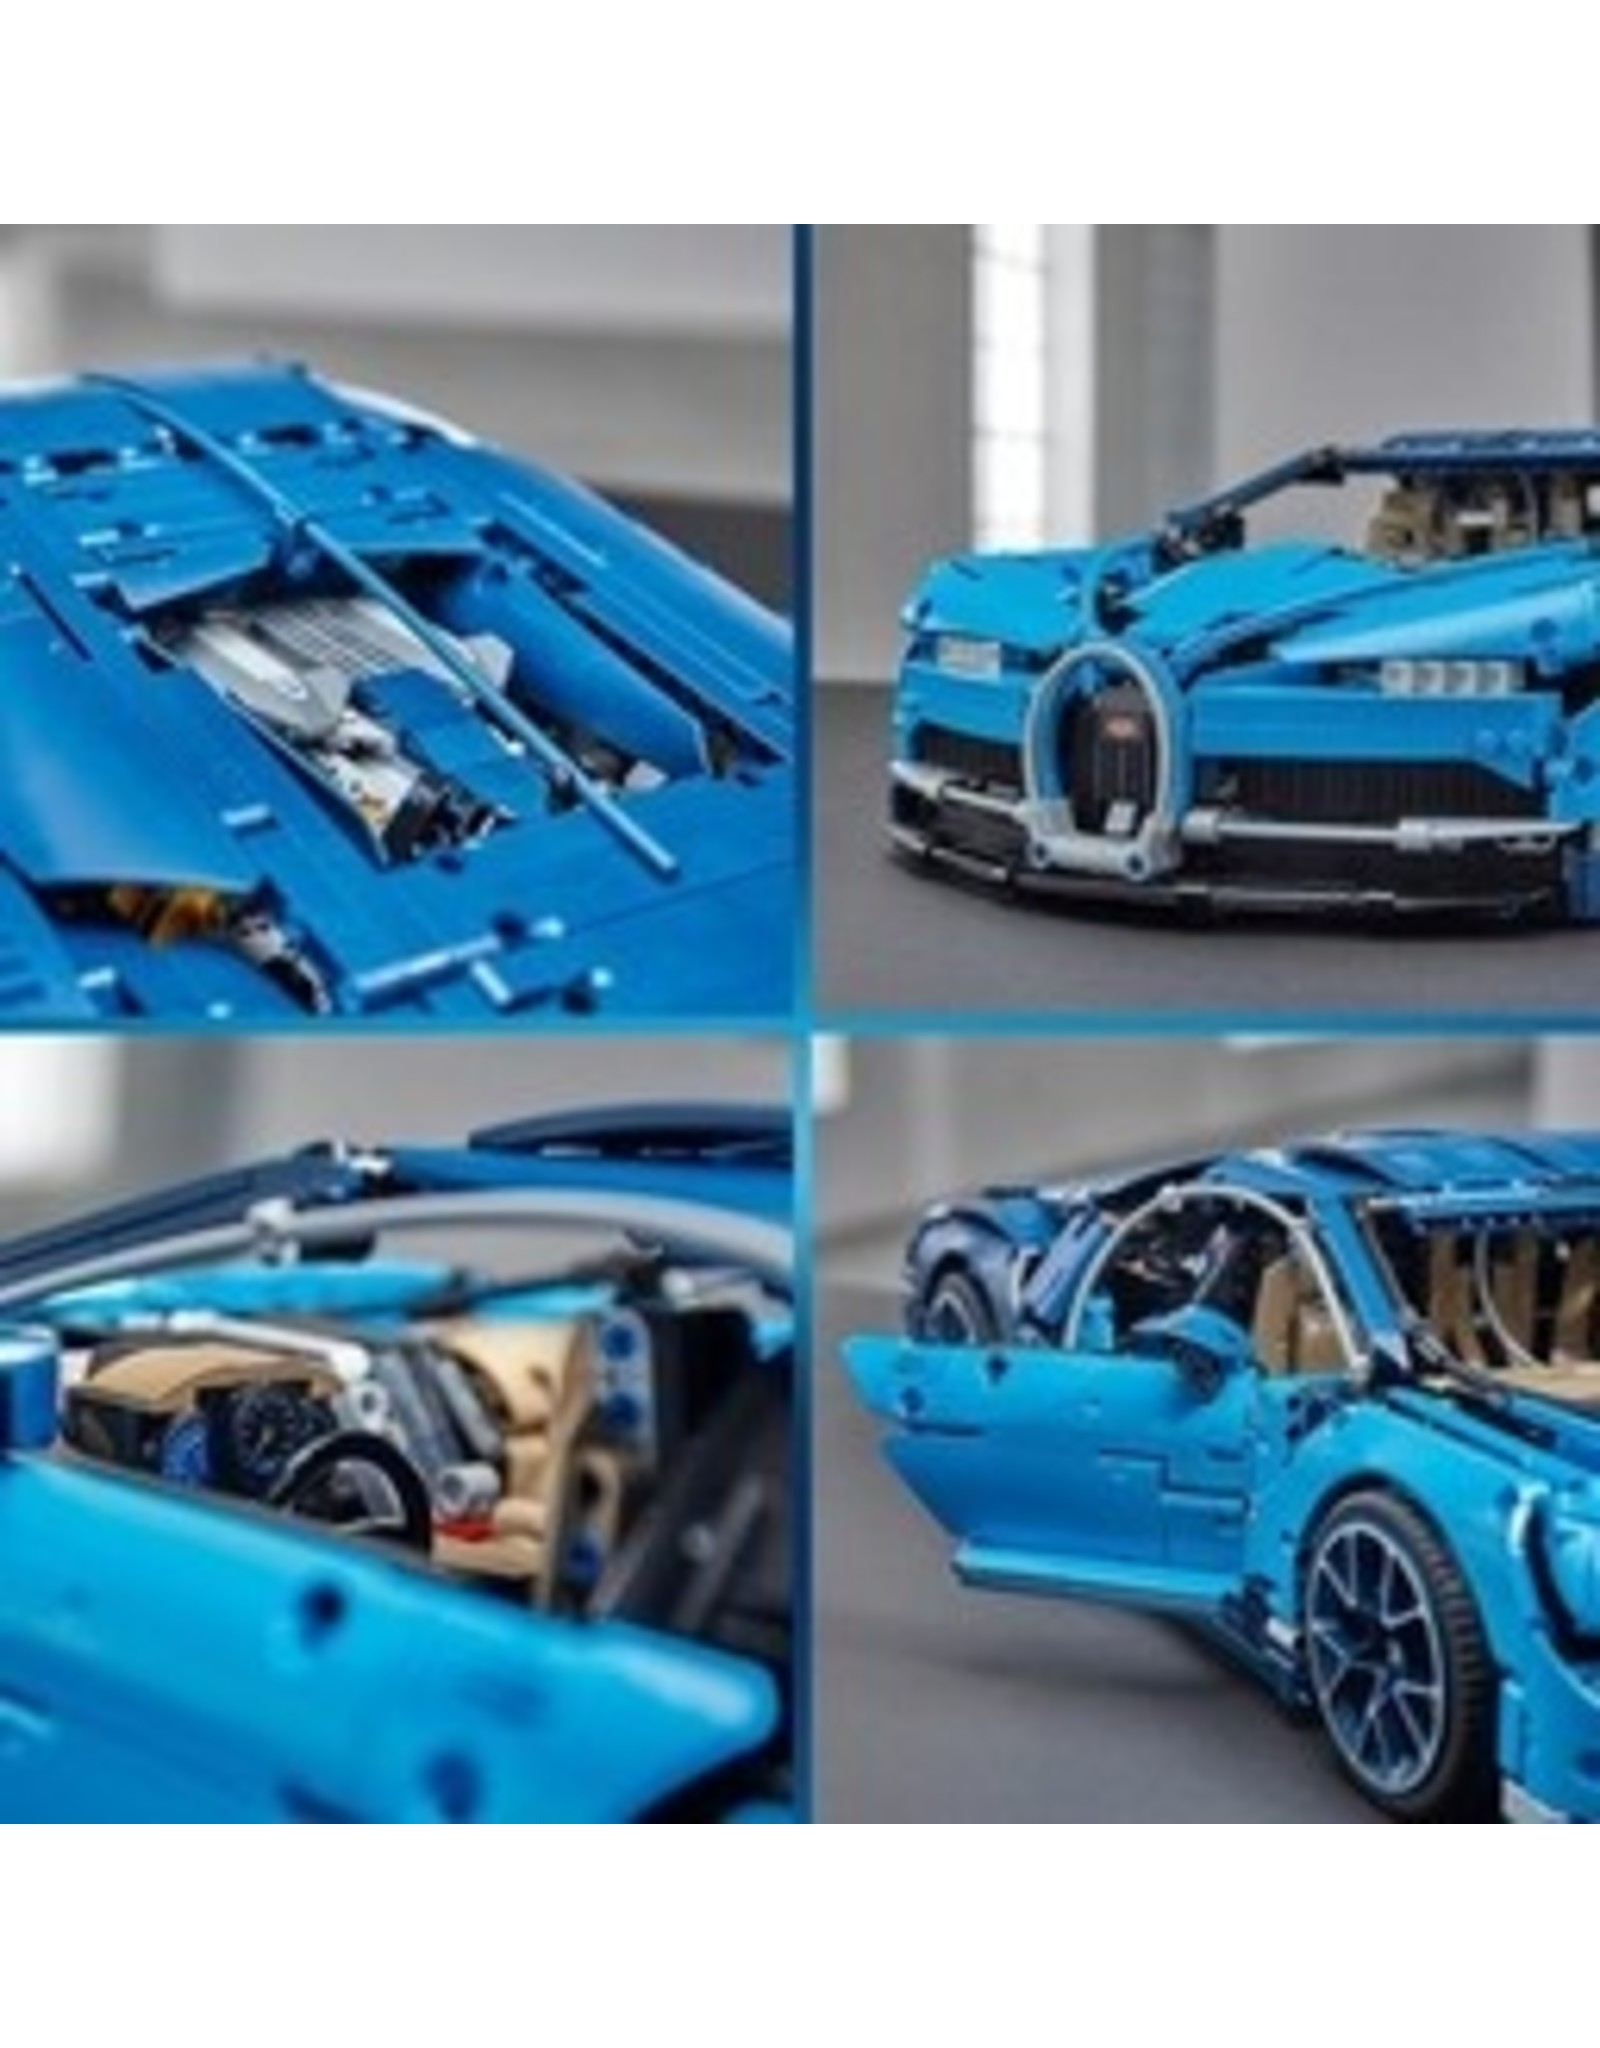 Lego LEGO Technic Bugatti Chiron - 42083